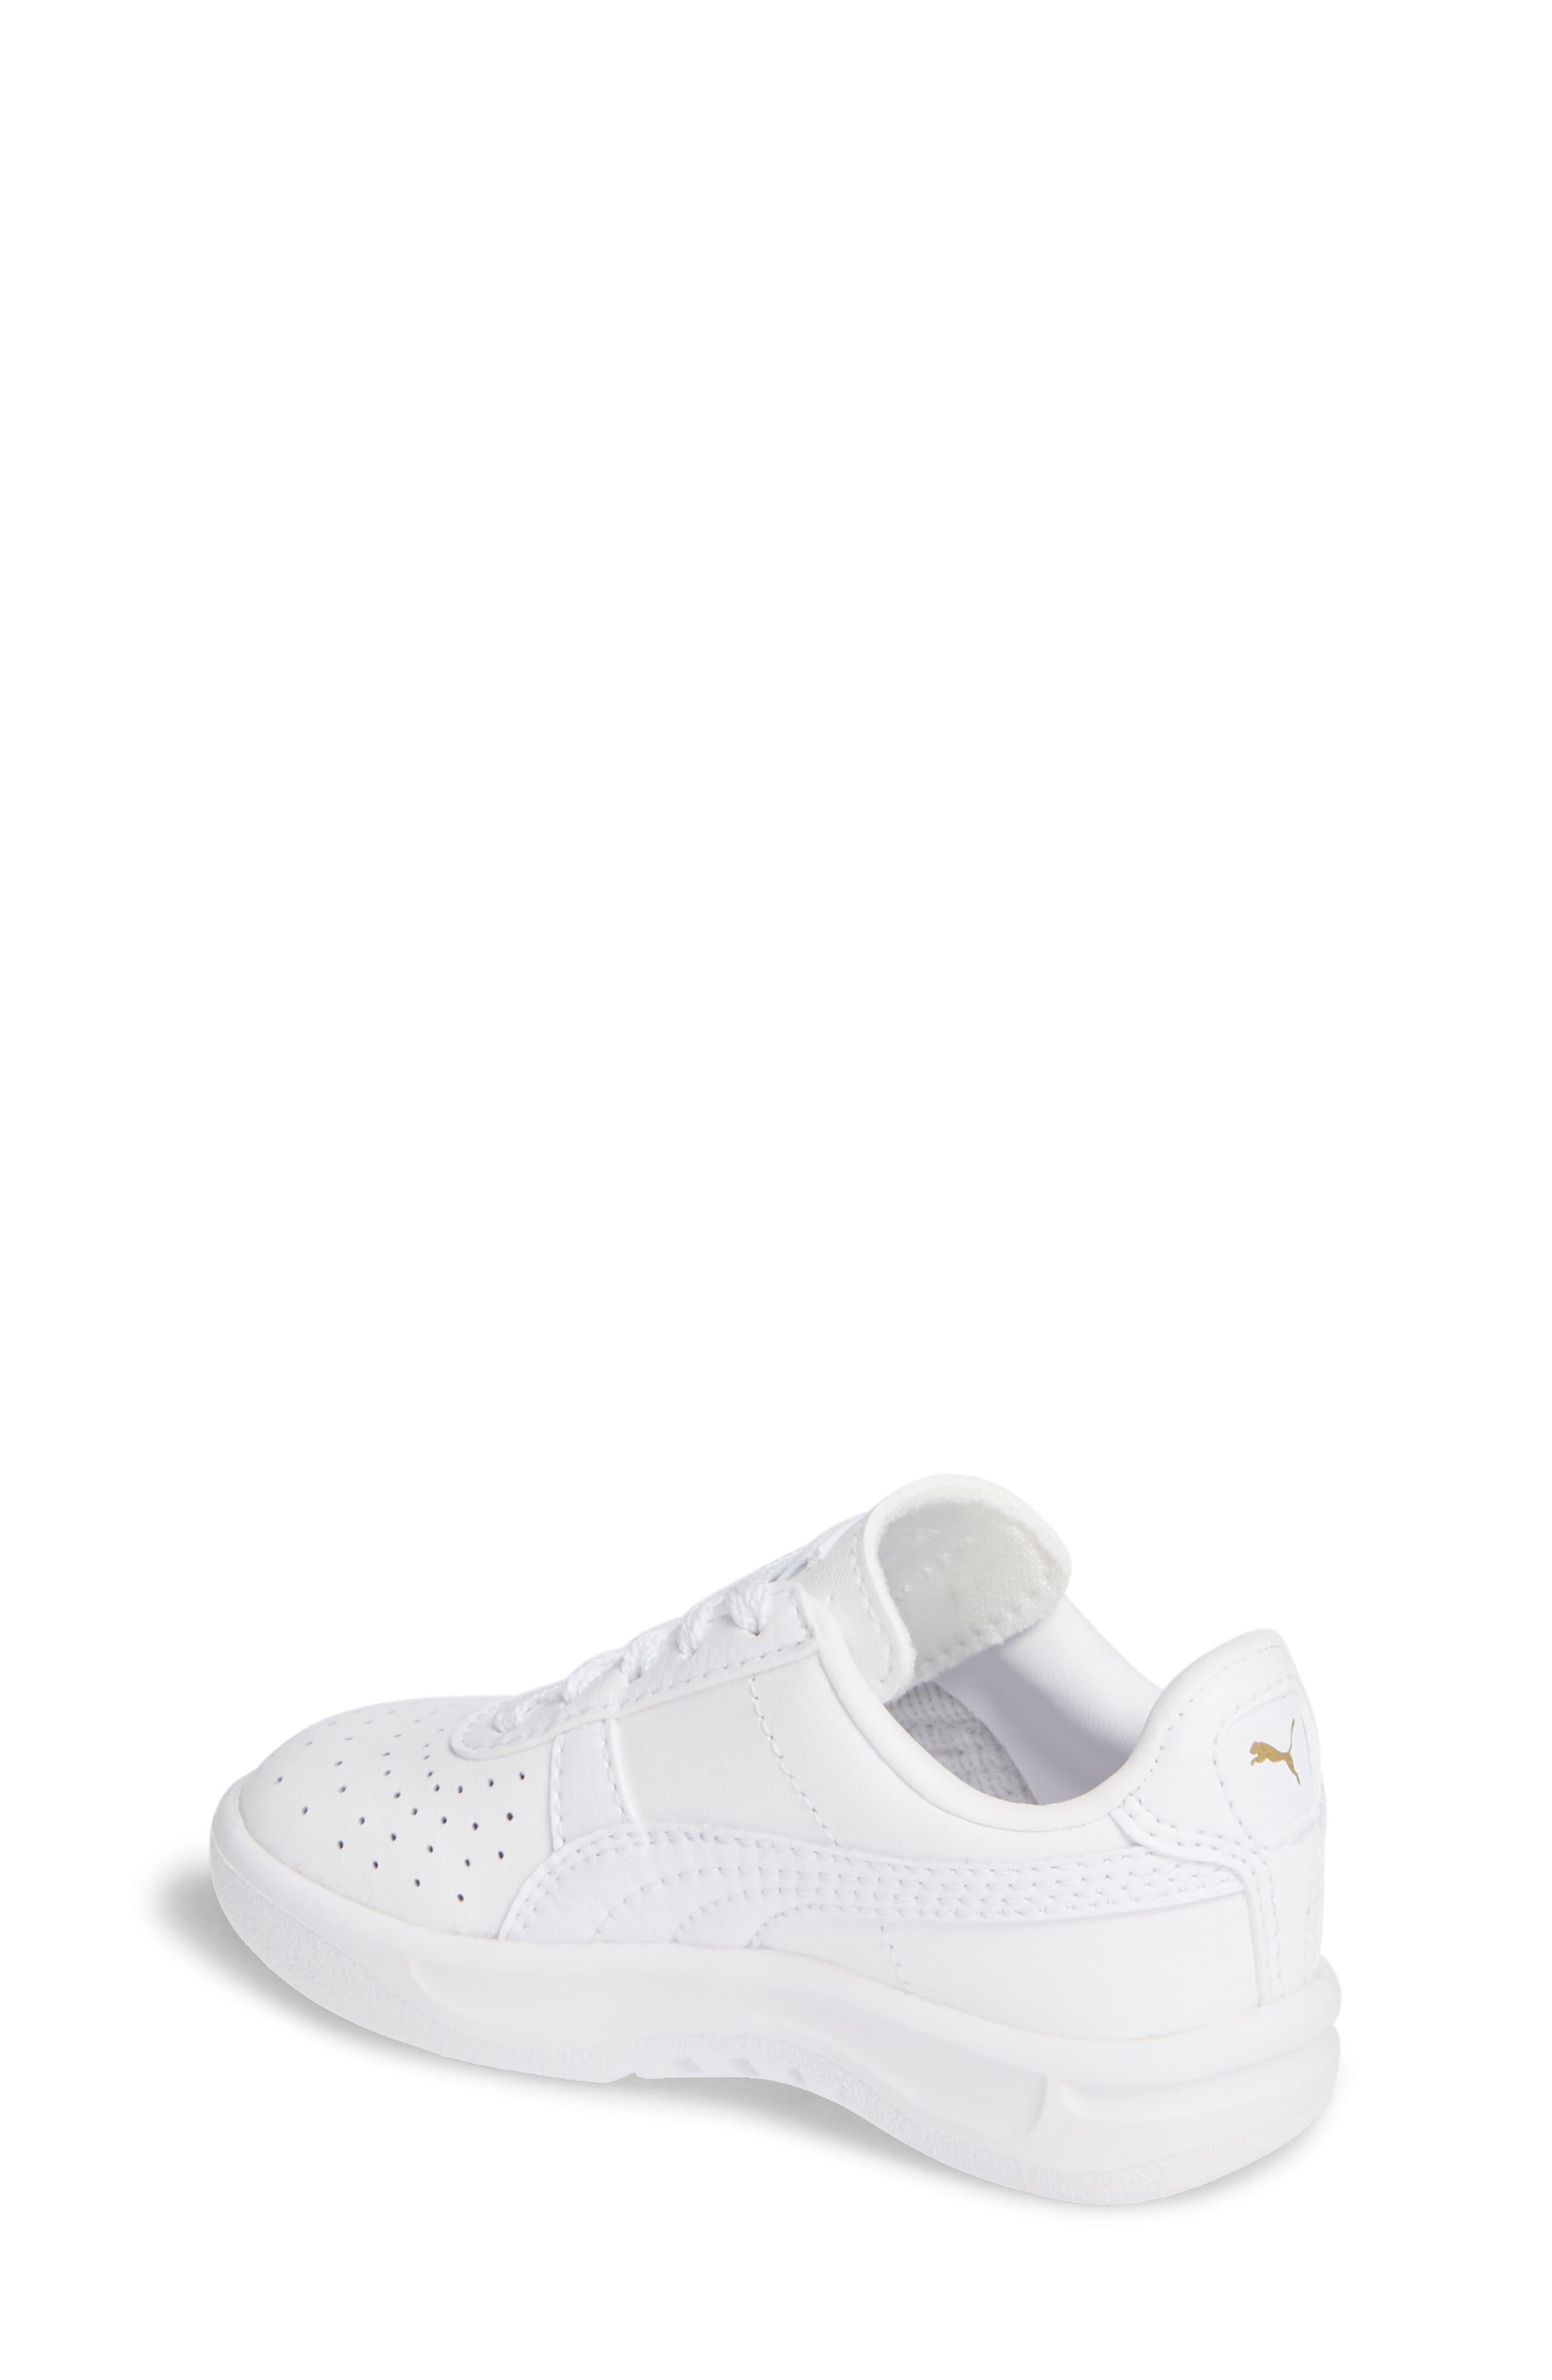 GV Special Sneaker,                             Alternate thumbnail 2, color,                             PUMA WHITE-PUMA TEAM GOLD